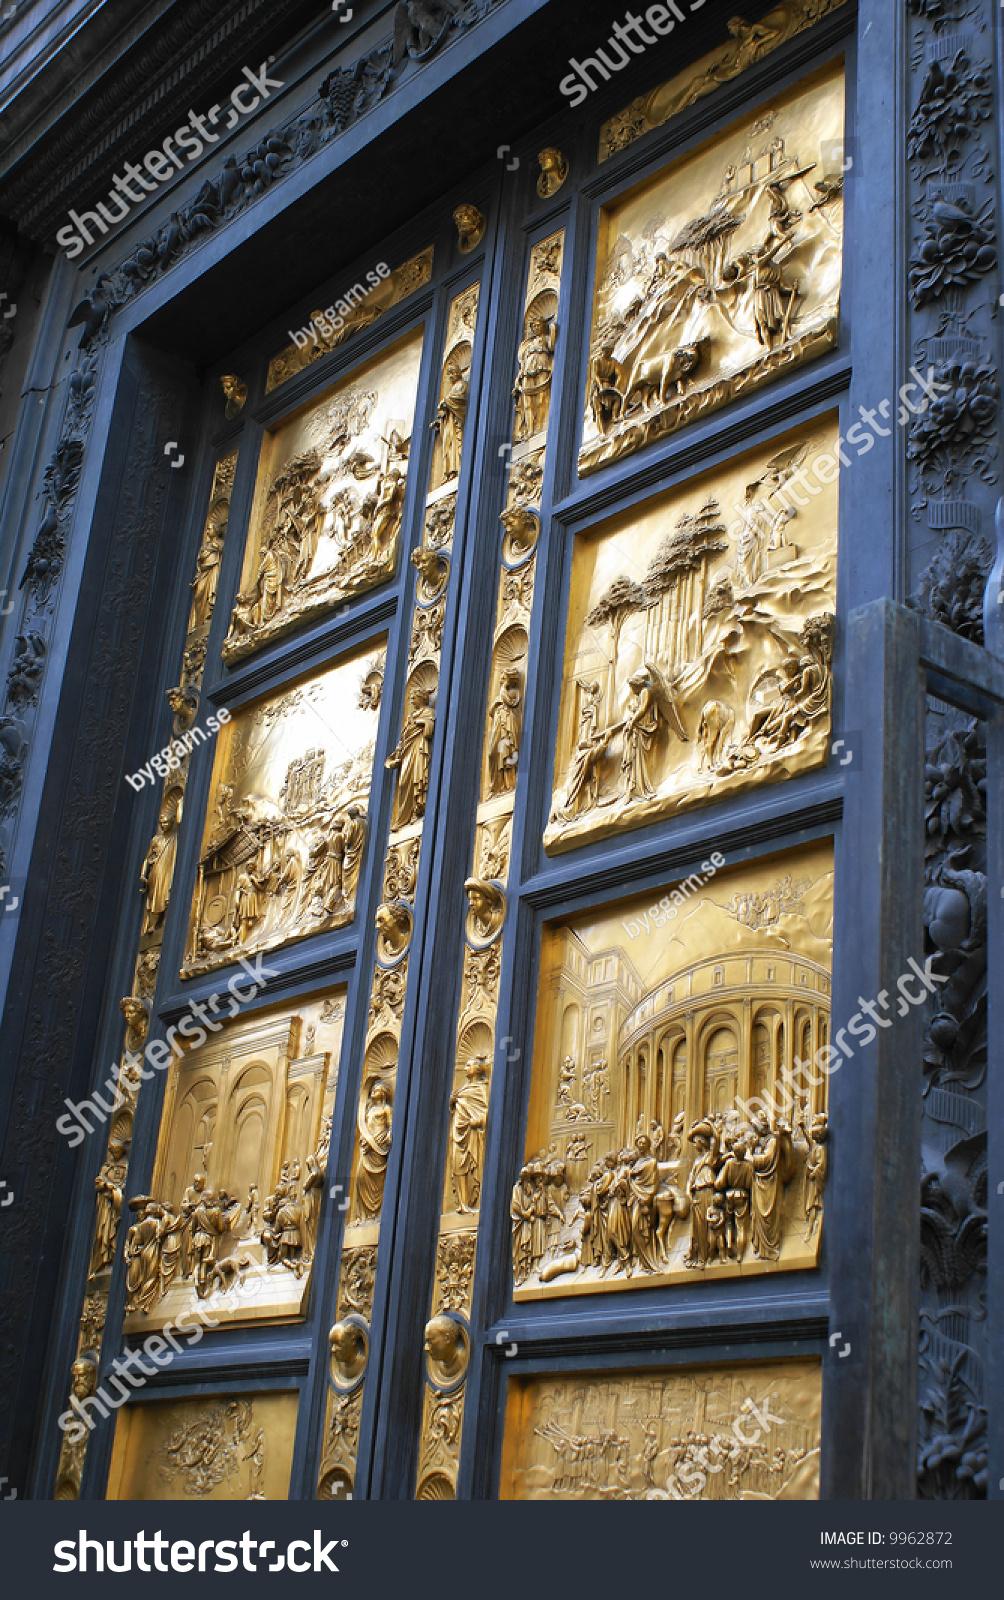 Golden Doors Duomo Florence Italy Stock Photo 9962872 ...